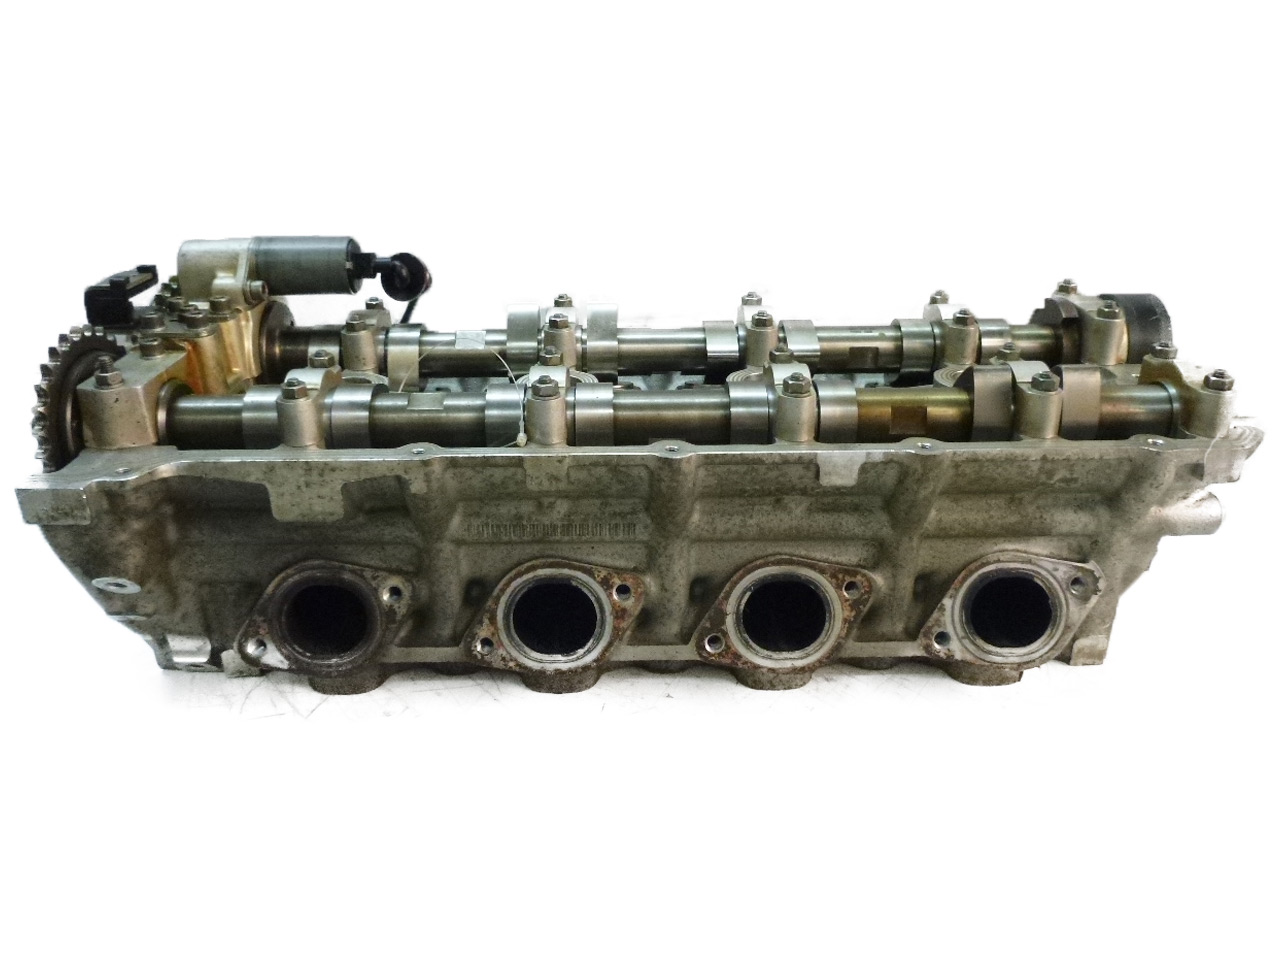 Zylinderkopf Kopf rechts Maserati Quattroporte V 4,2 V8 M139 400 PS 2205255